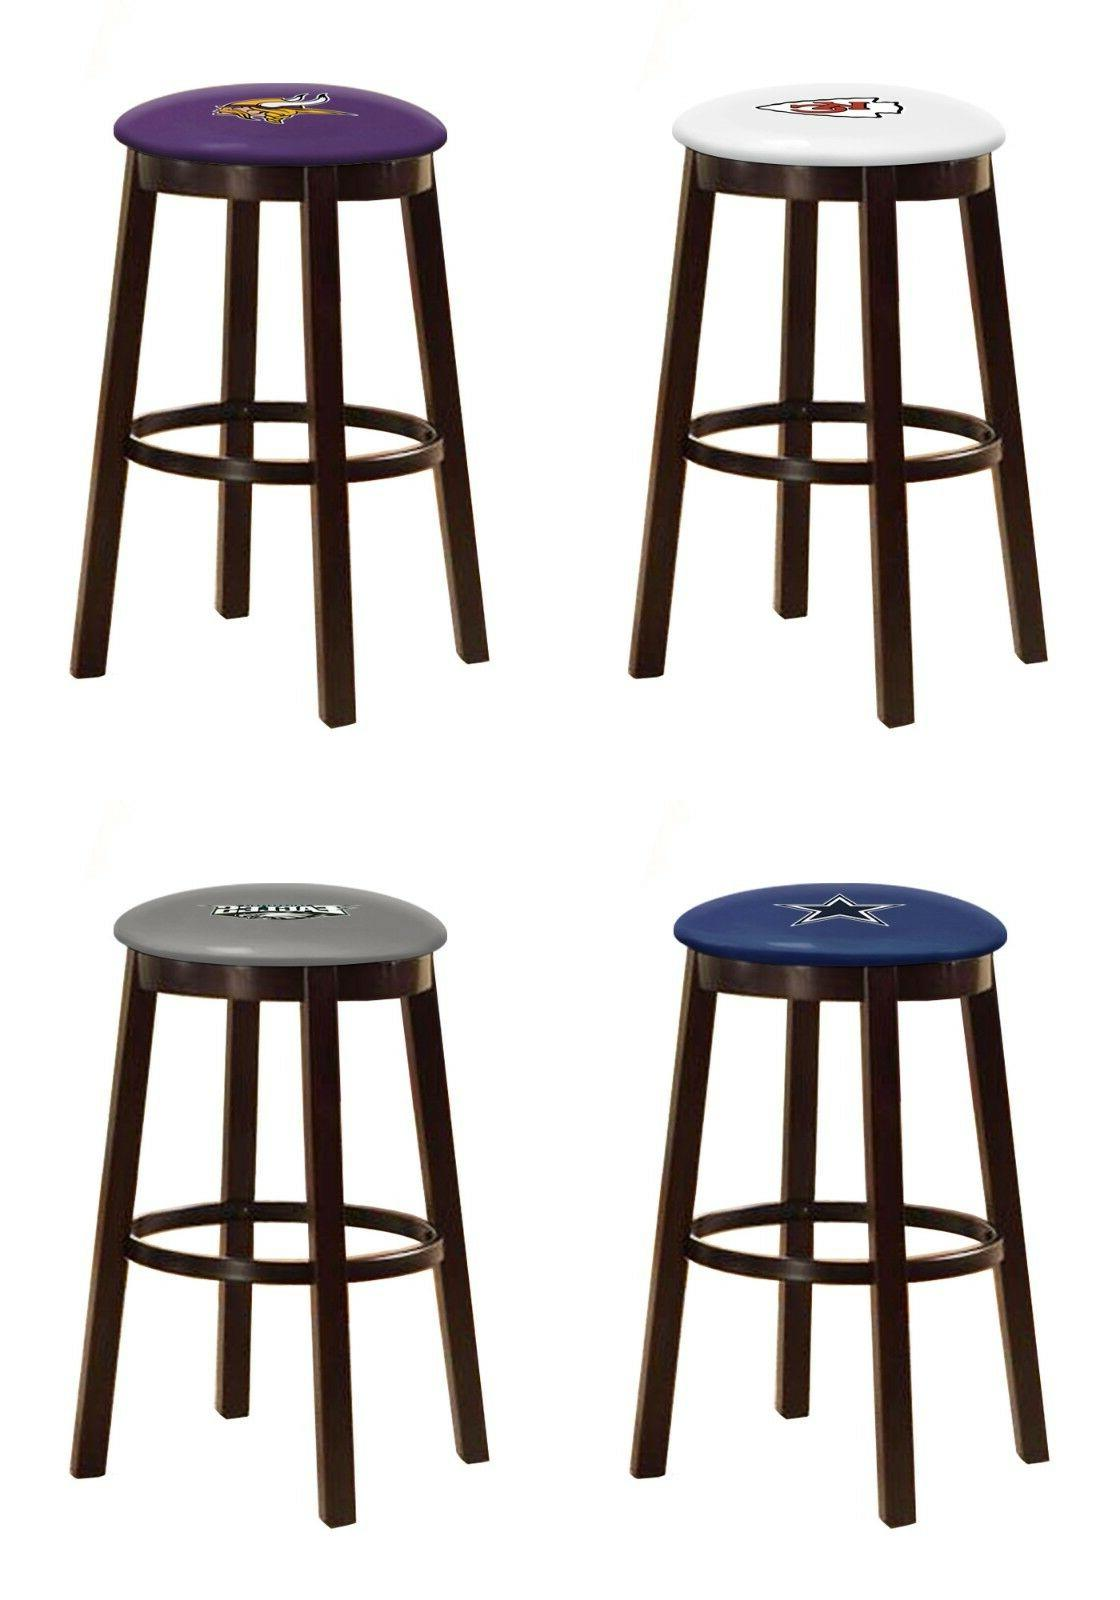 bar stool nfl sport team logo decal